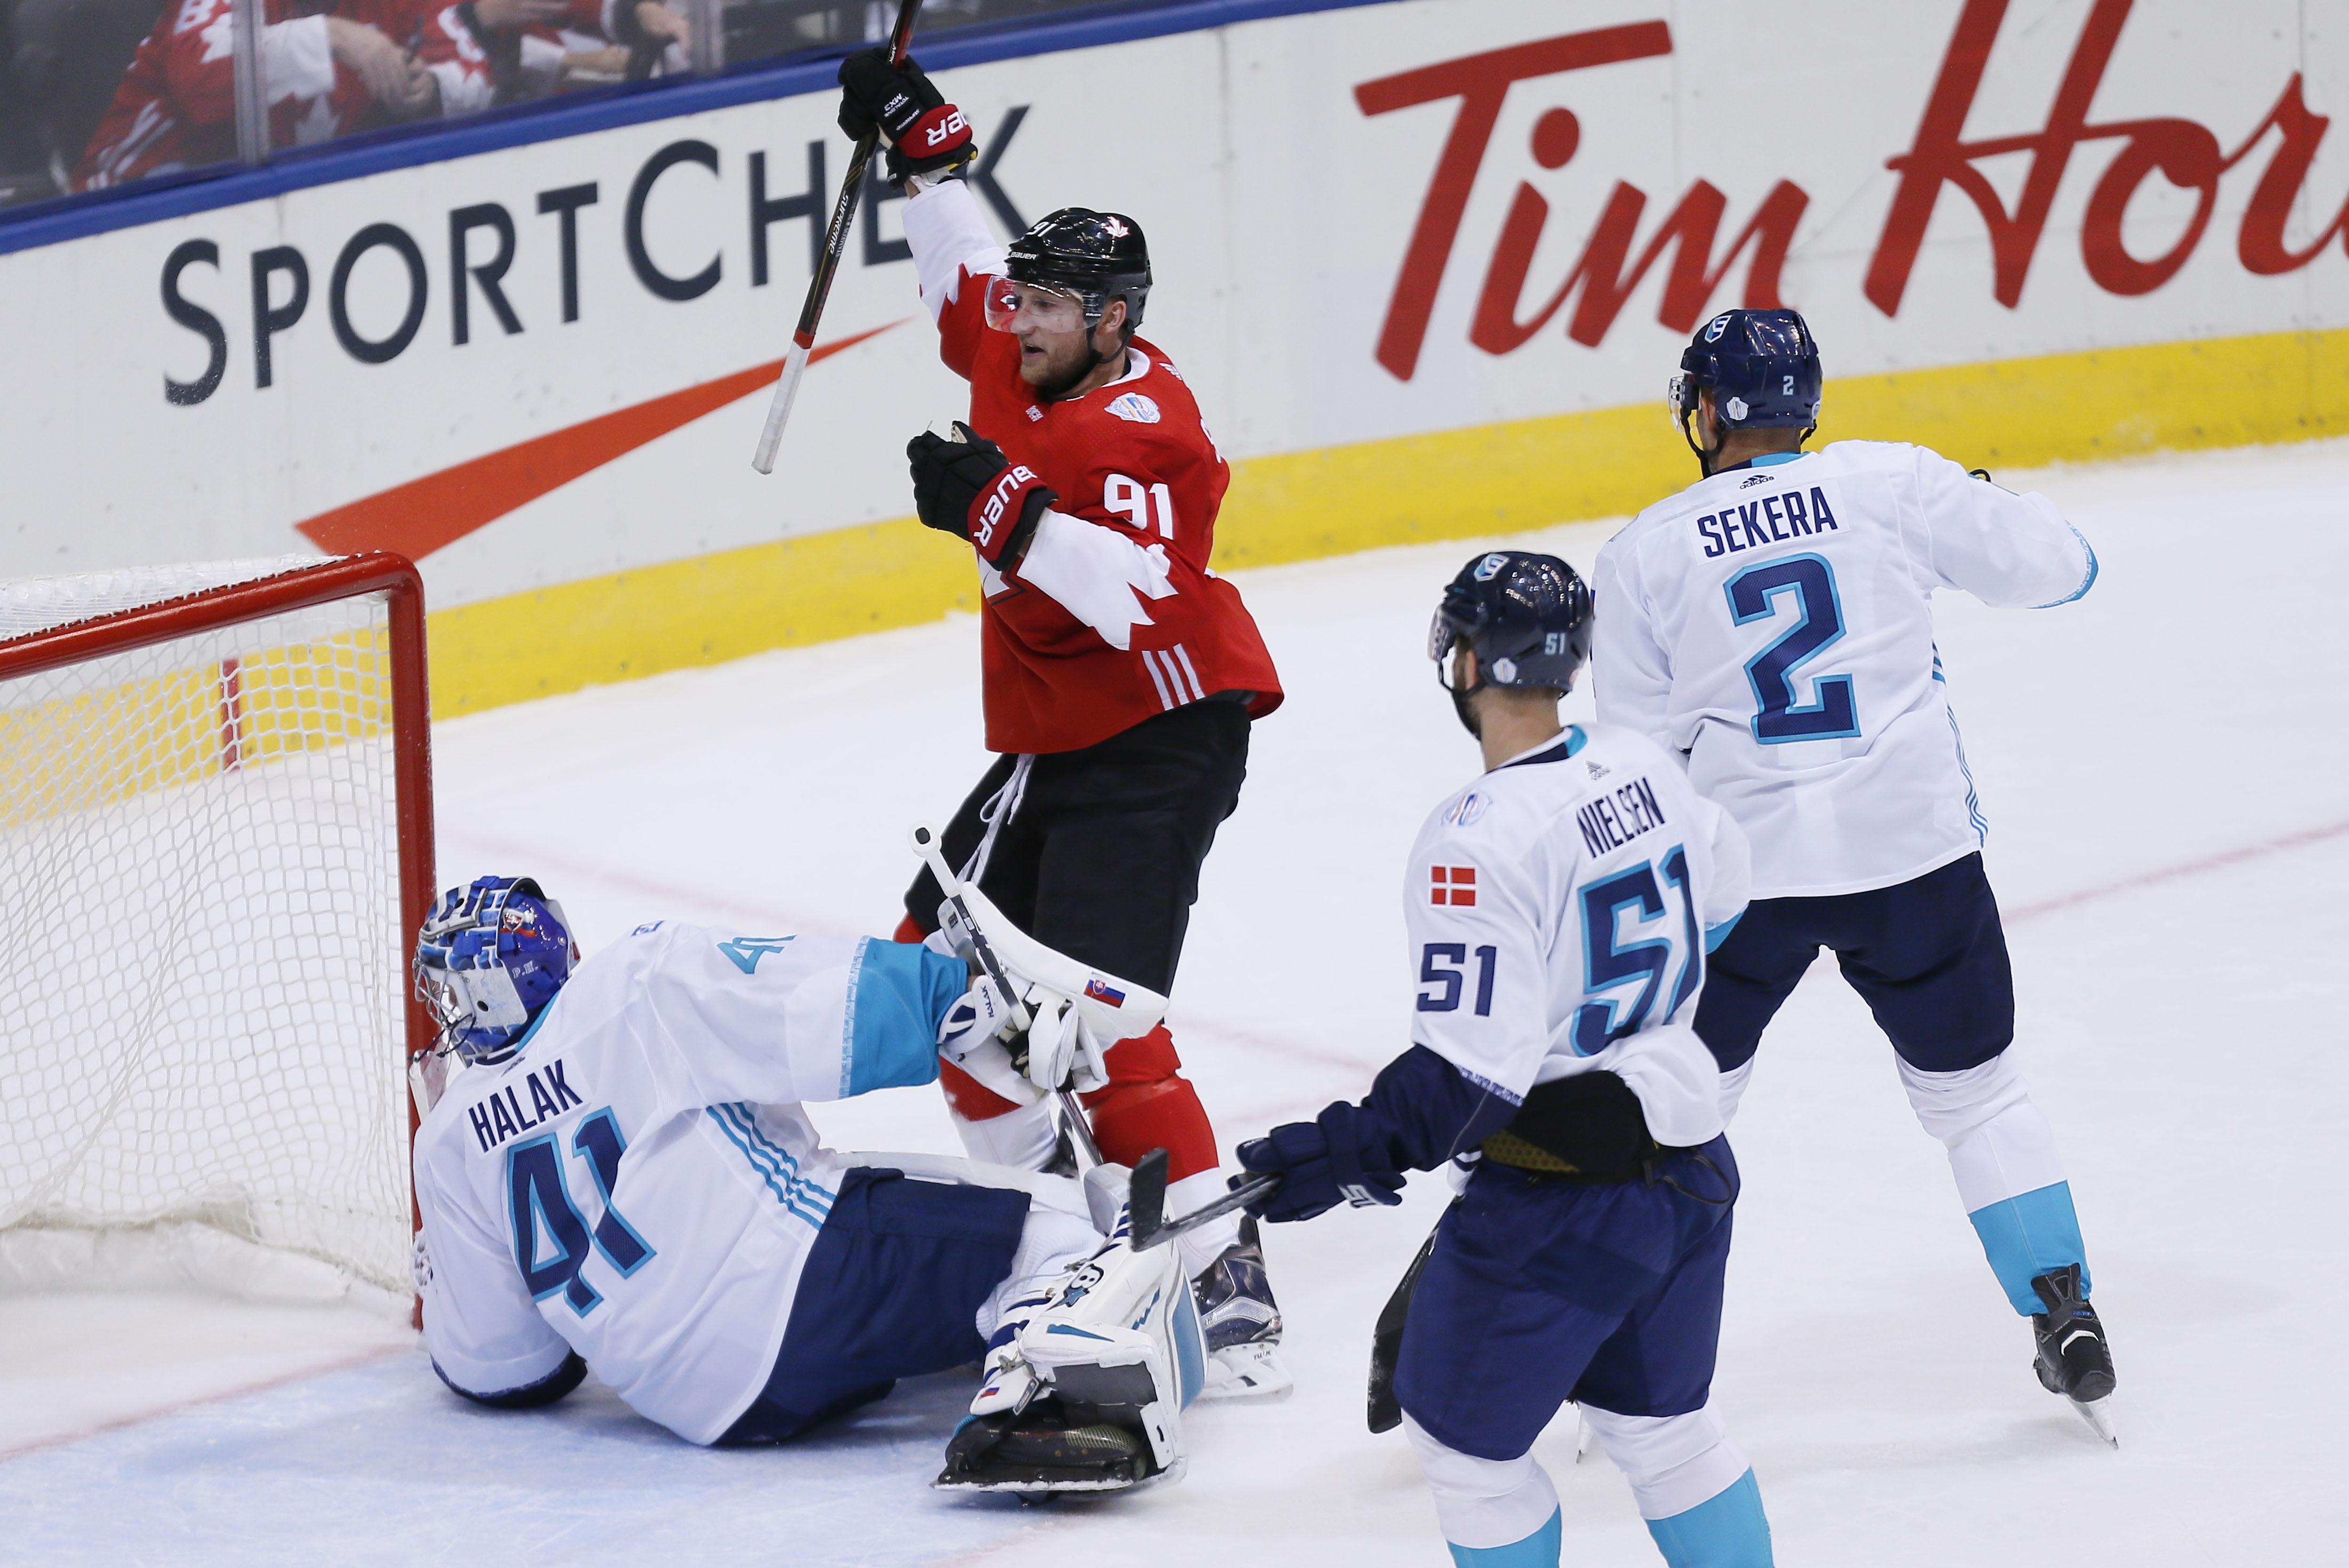 Hockey: World Cup of Hockey-Final-Team Canada vs Team Europe